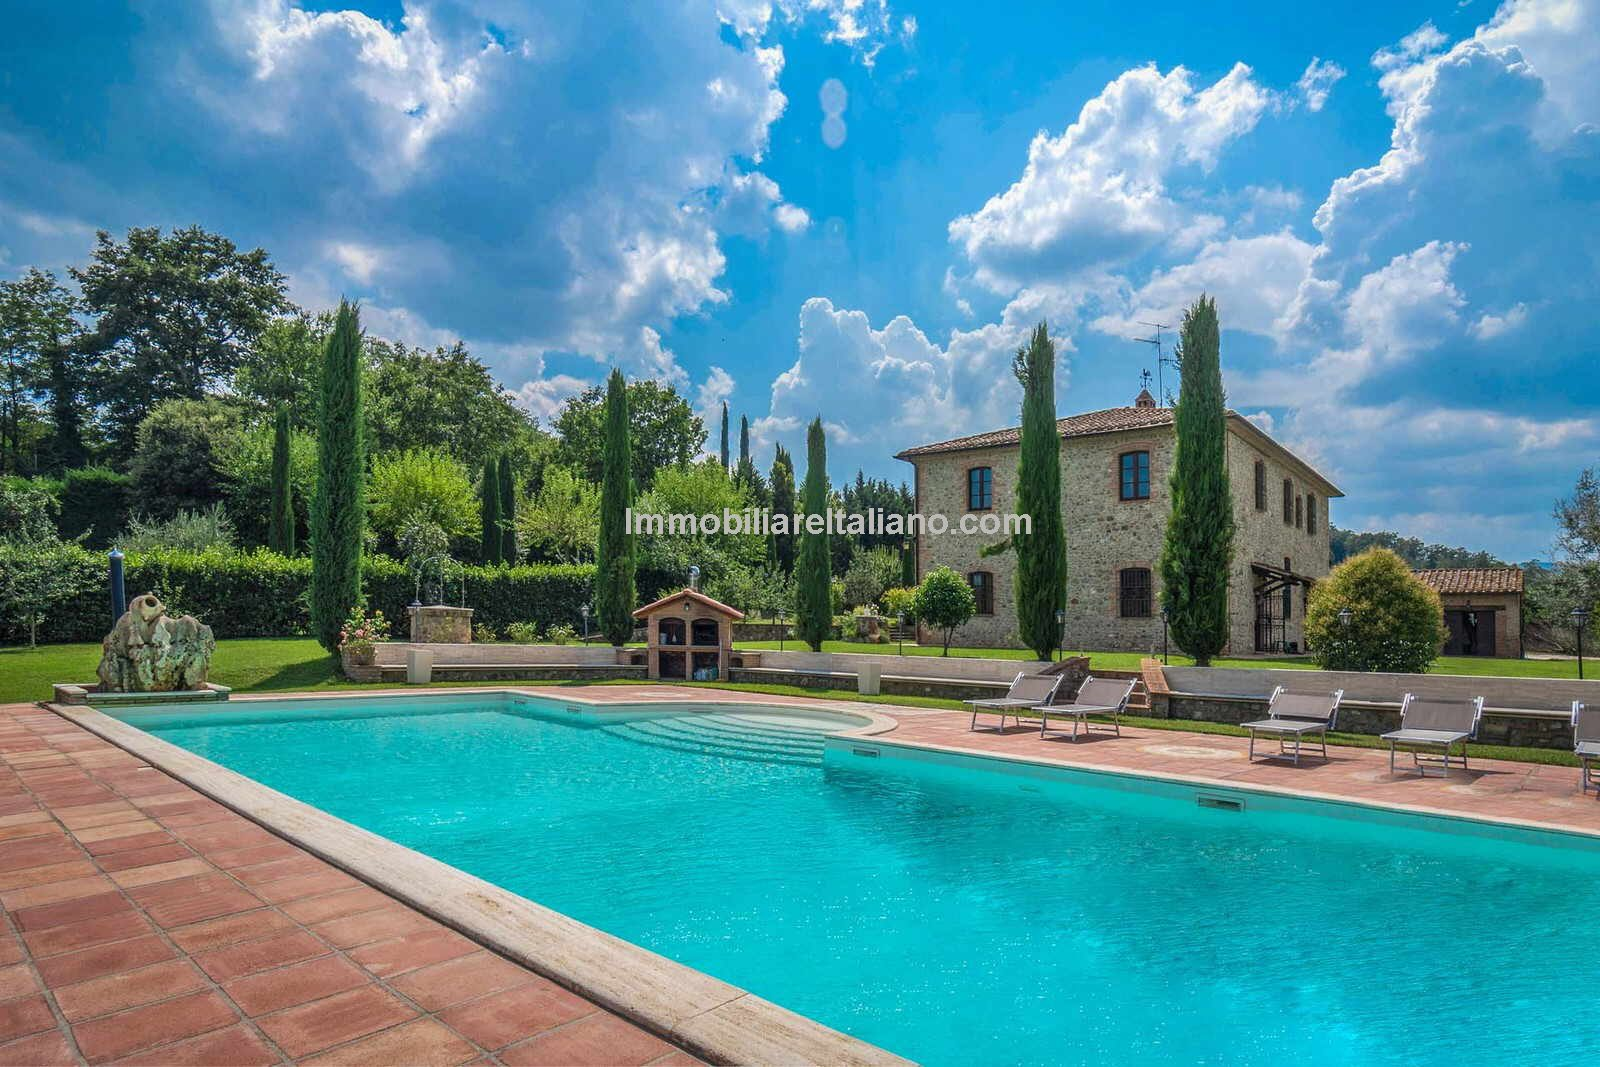 Umbria real estate pool view